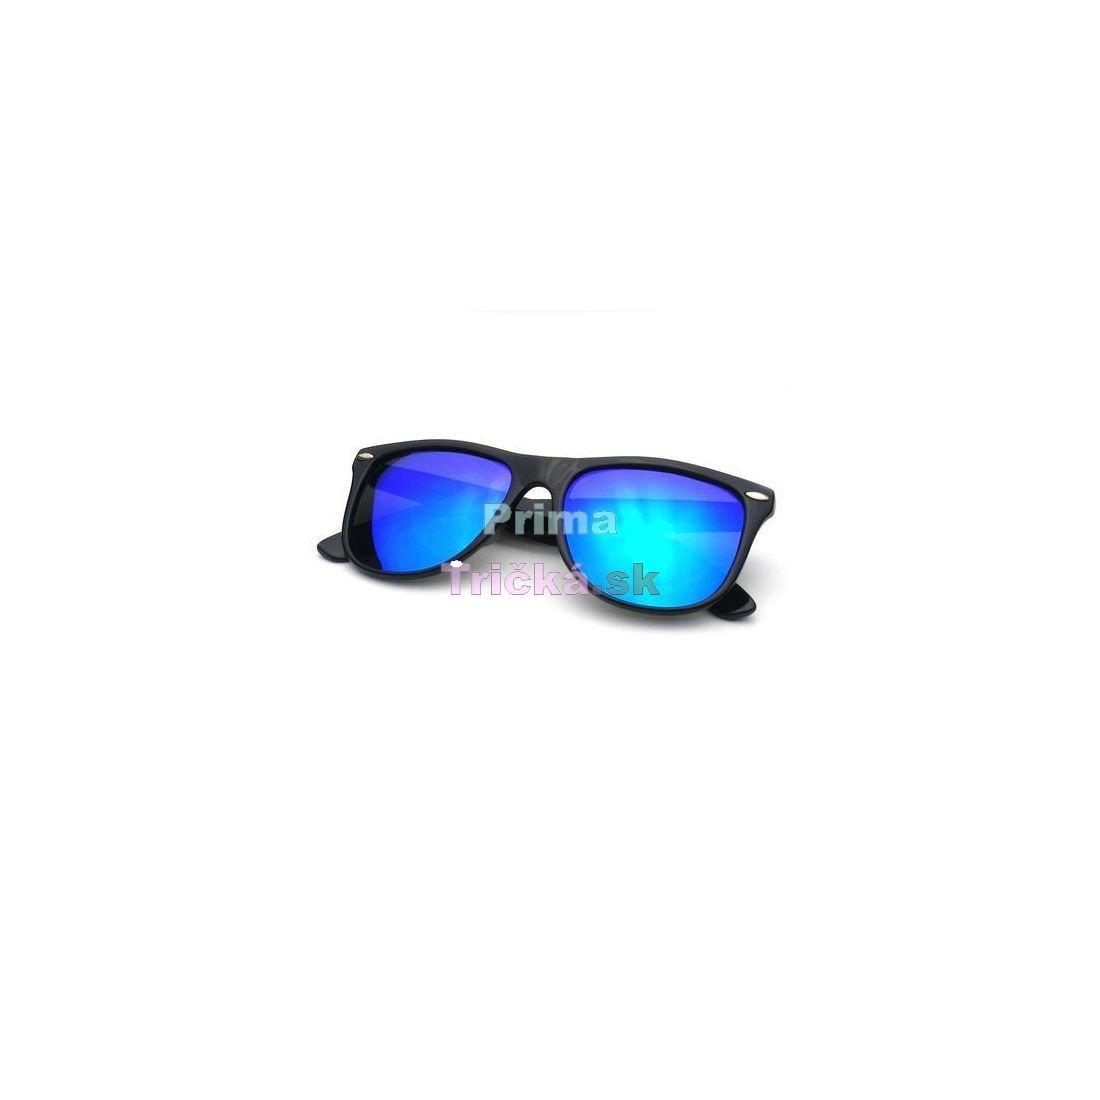 b3b3b53db Prima tričká - Slnečné okuliare - Wayfarer - Wayfarer modré